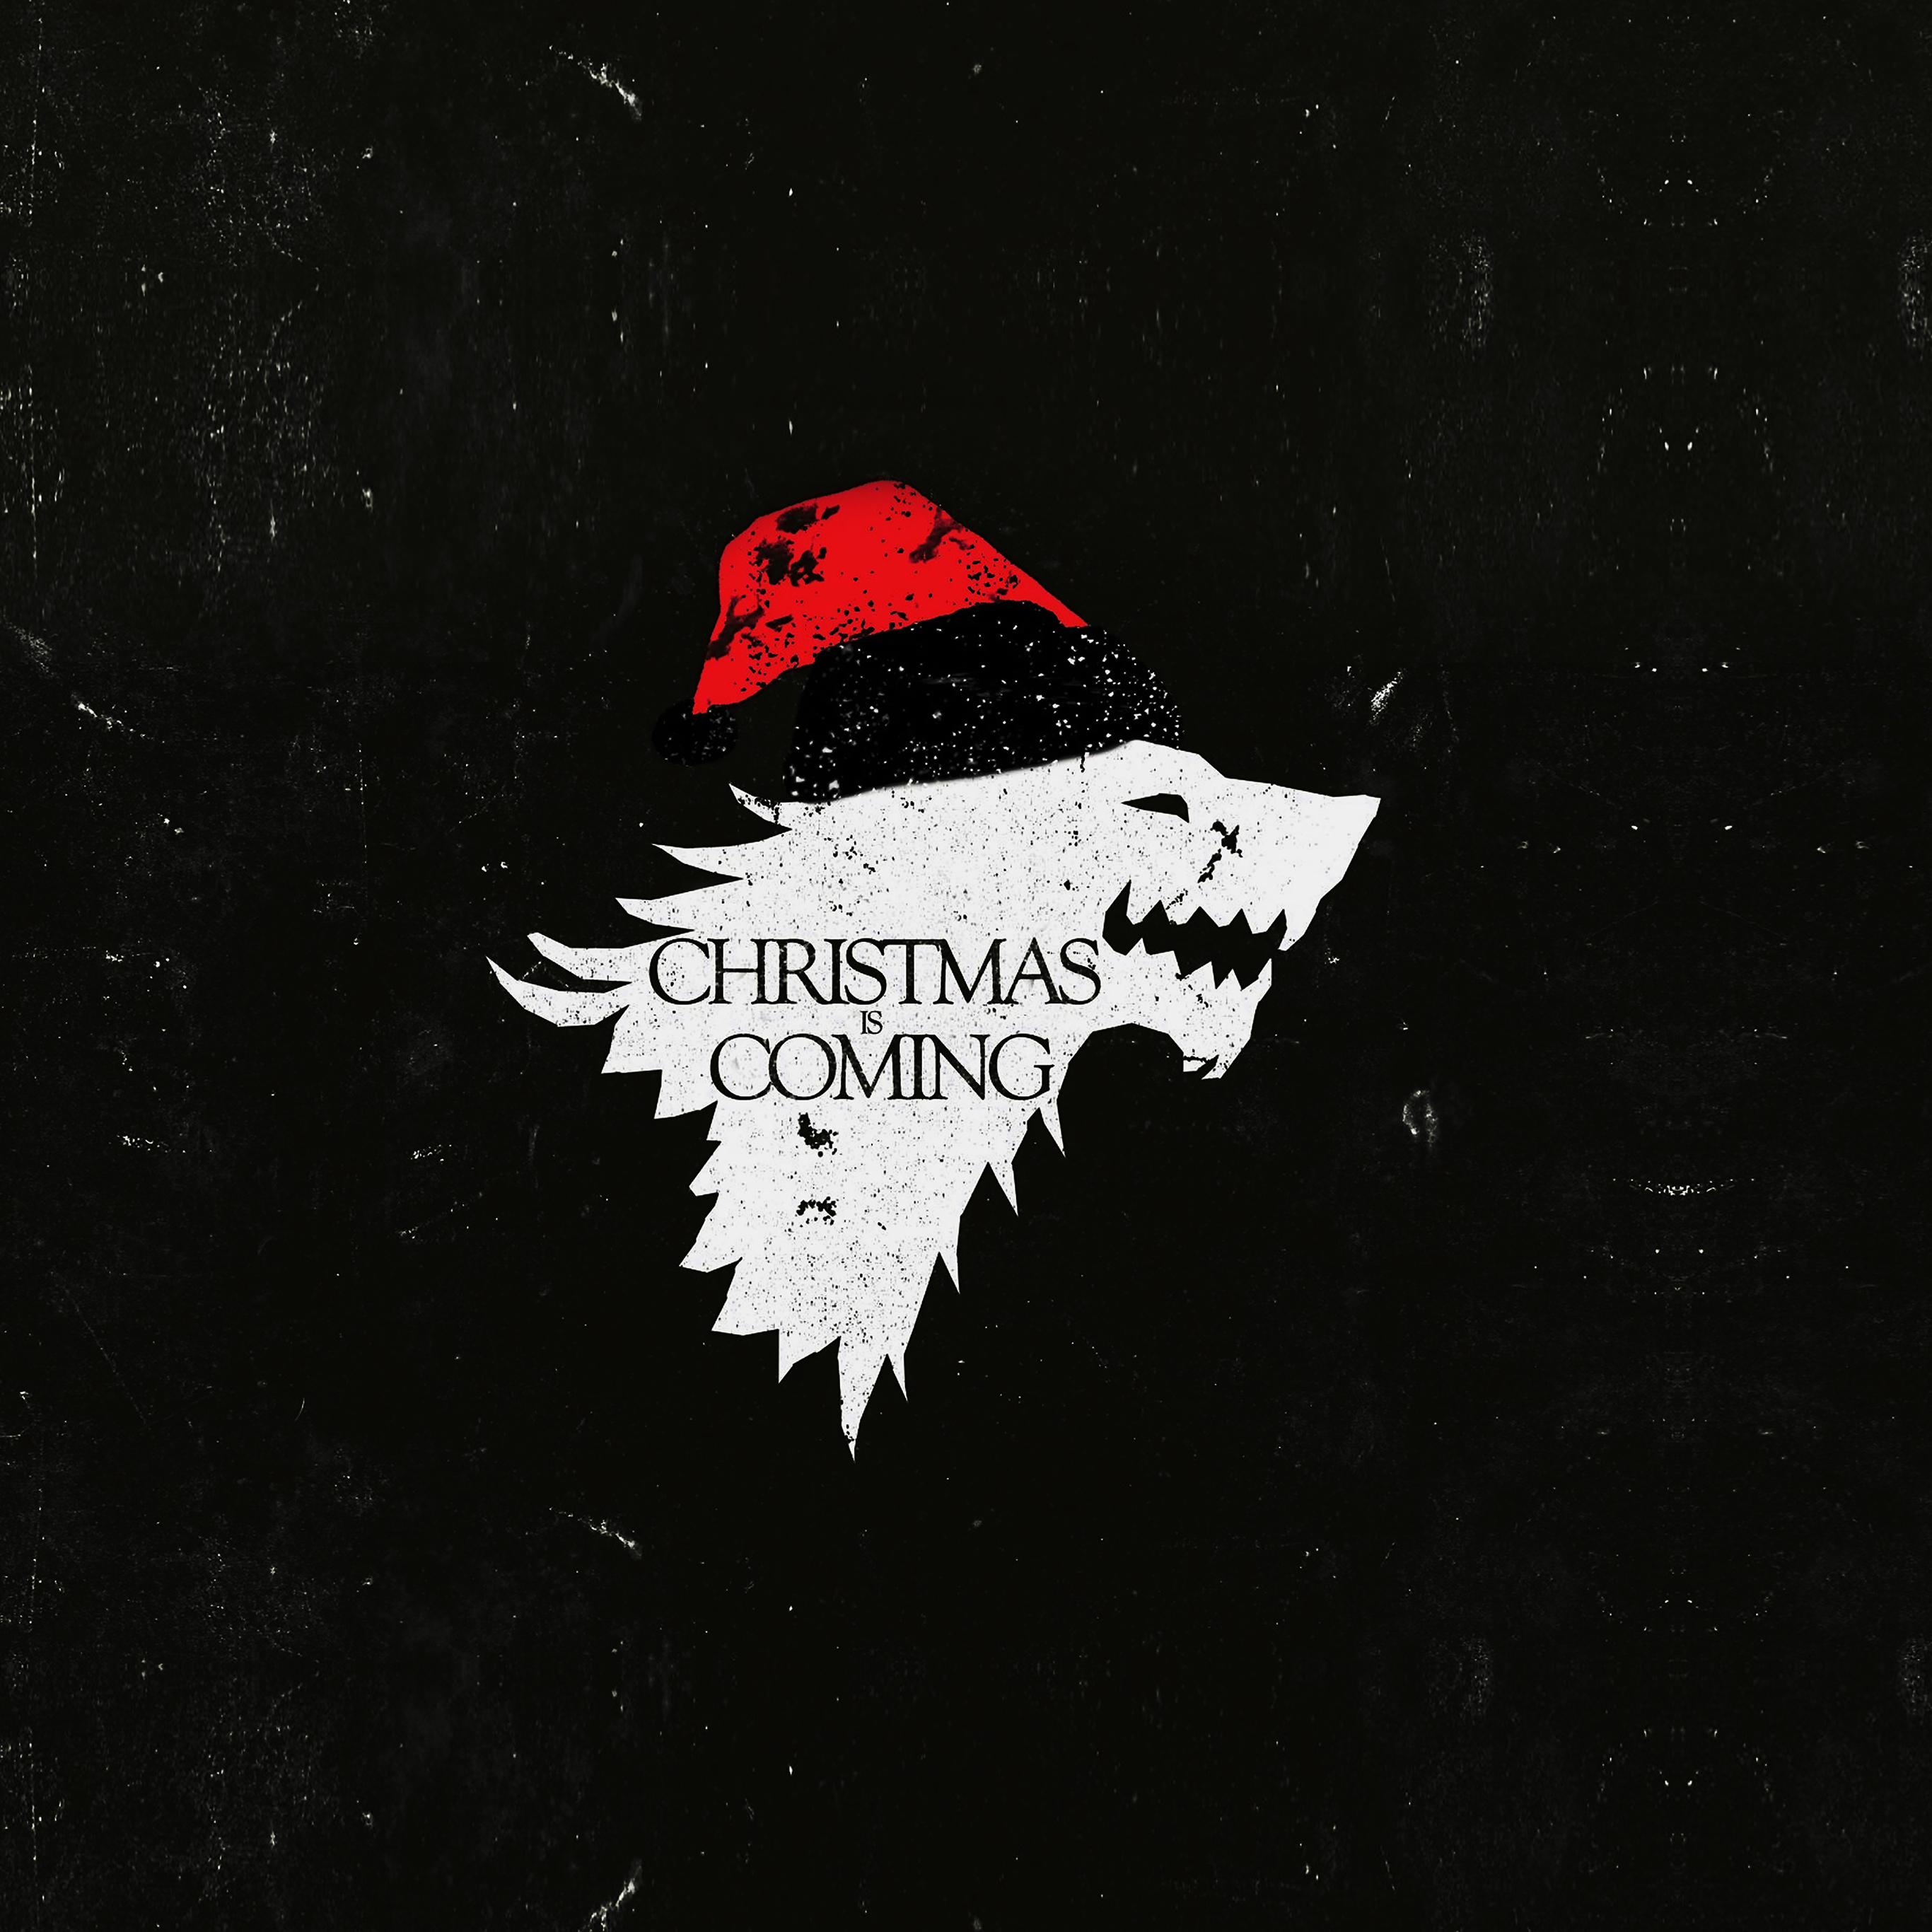 Ag24 Christmas Is Coming Dark Game Of Thrones Art Wallpaper